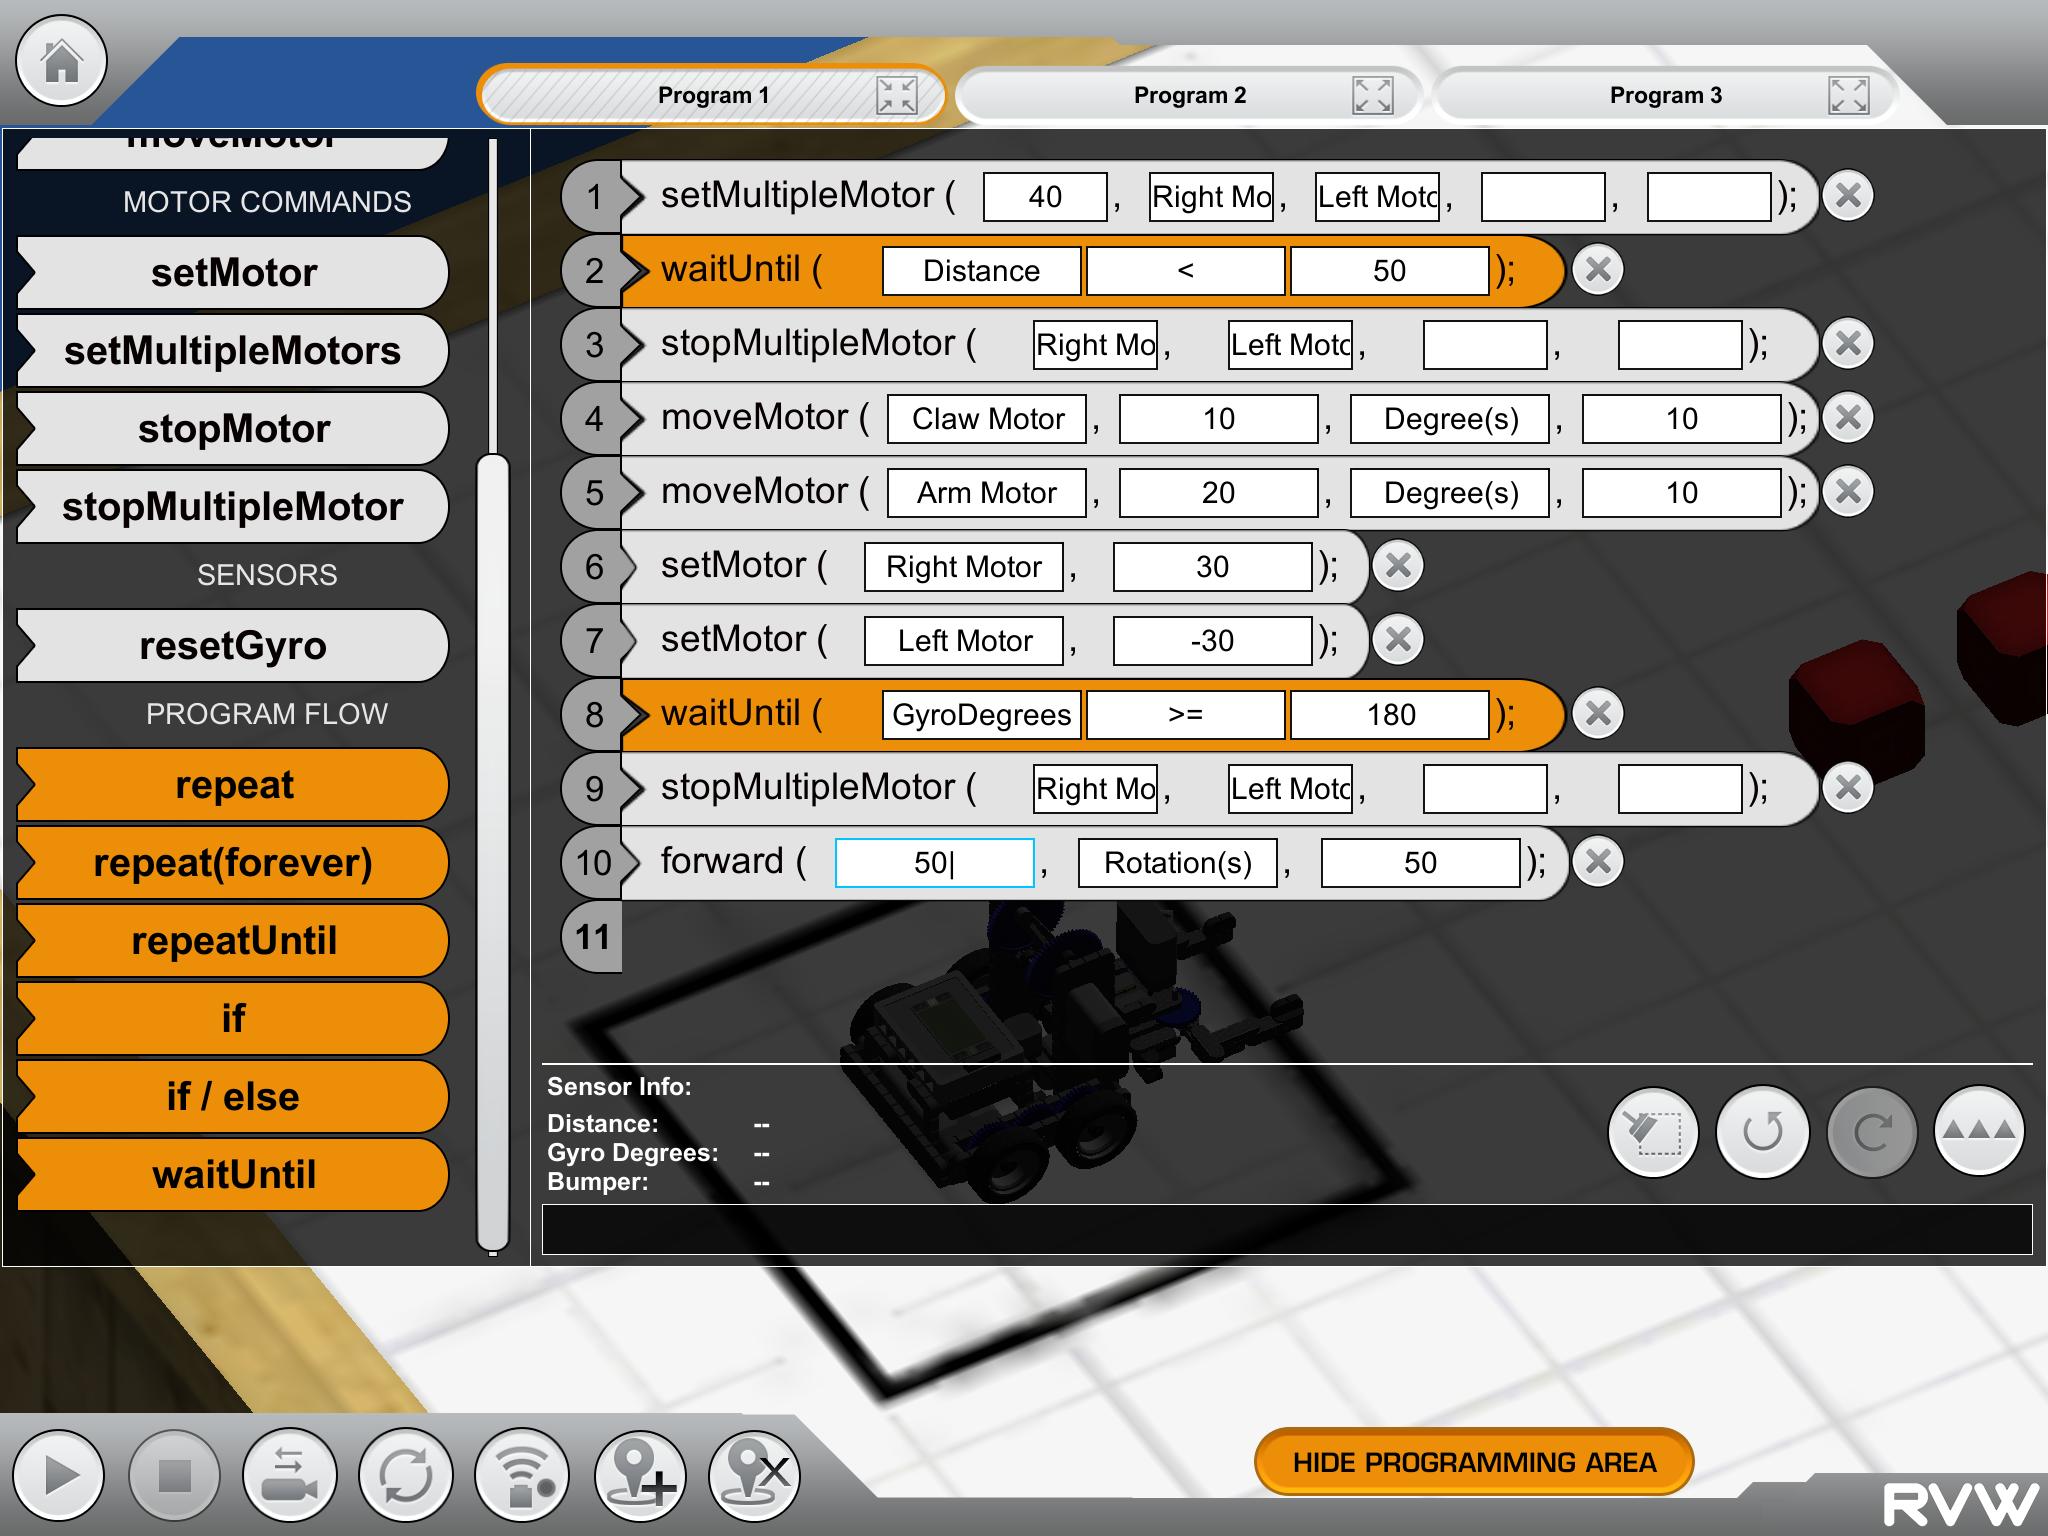 Download free Robotc Sonar Program - writethepiratebay